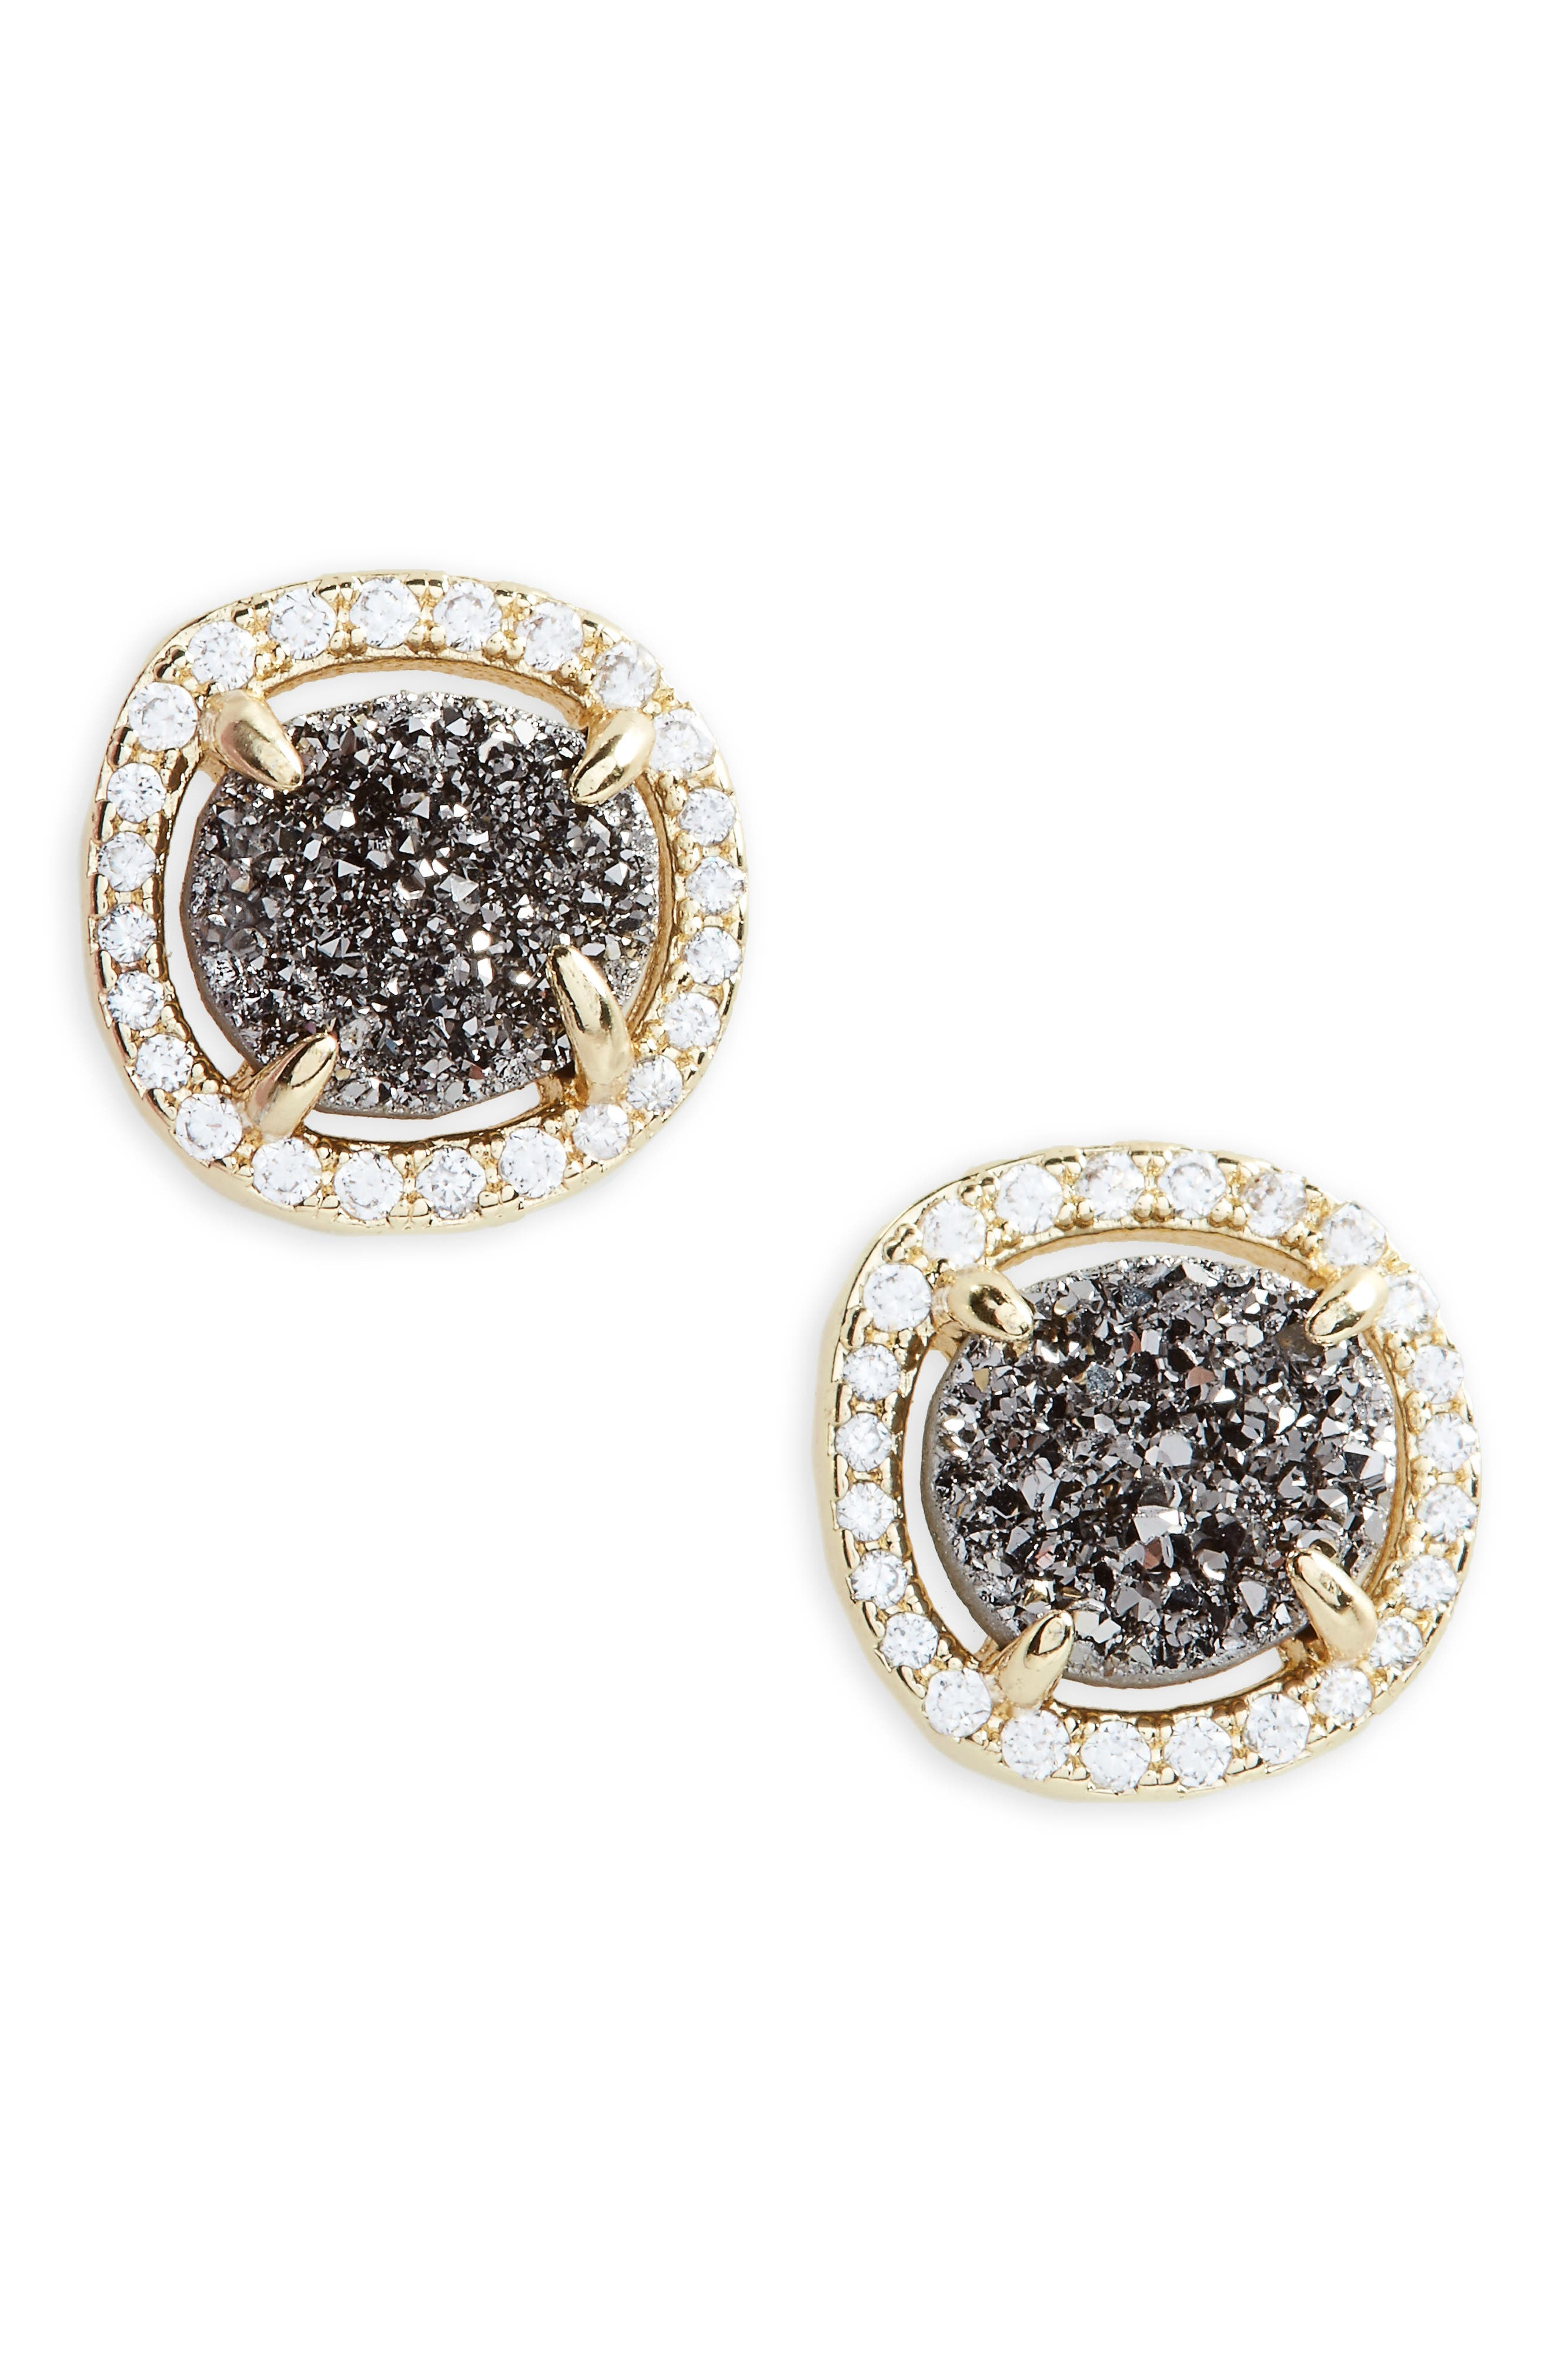 Melinda Maria Sarah Louise Drusy Stud Earrings